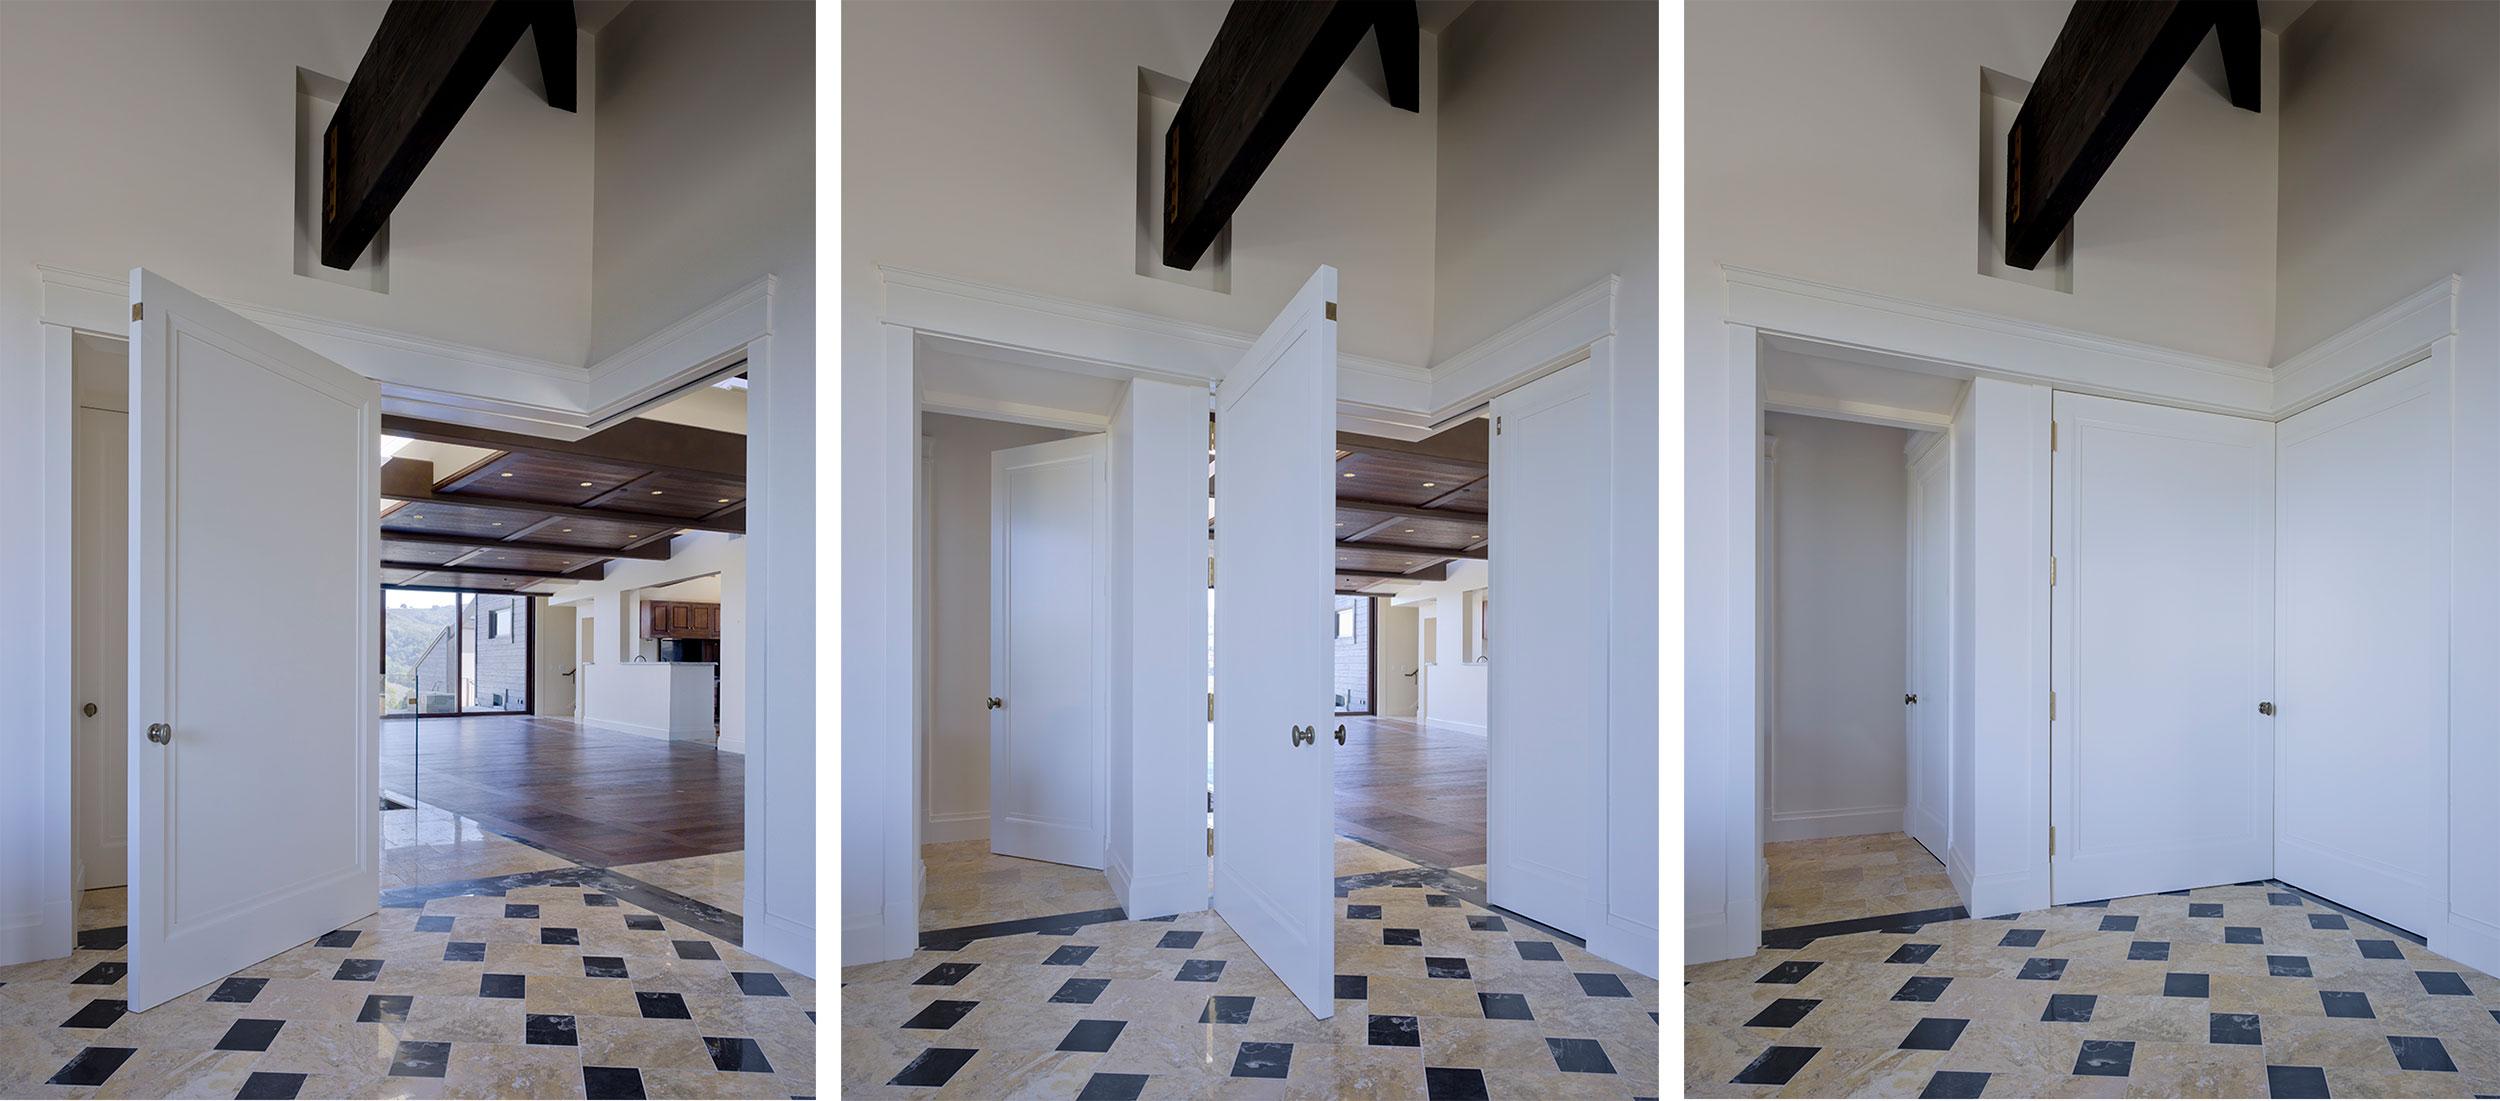 California Residence, House, Sustainability, Doors, Flexibility